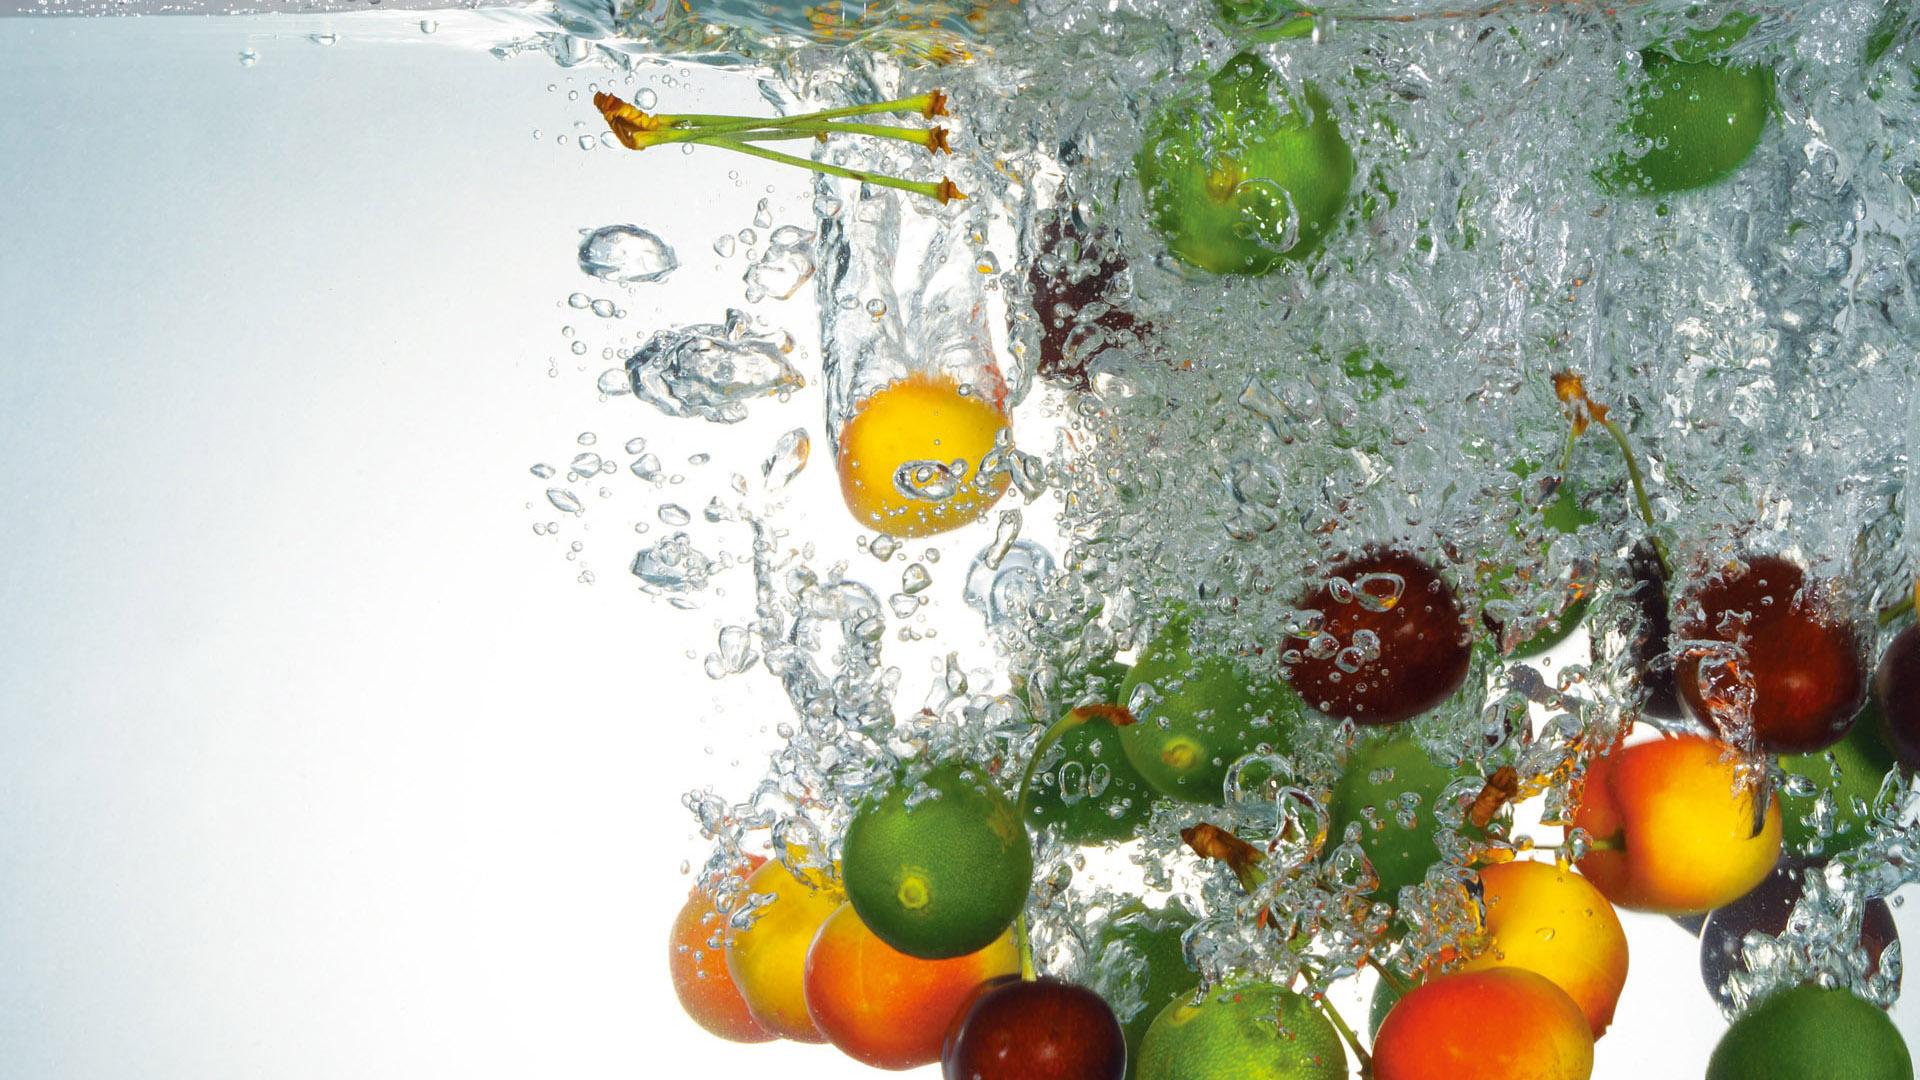 вода, капли, пузырьки